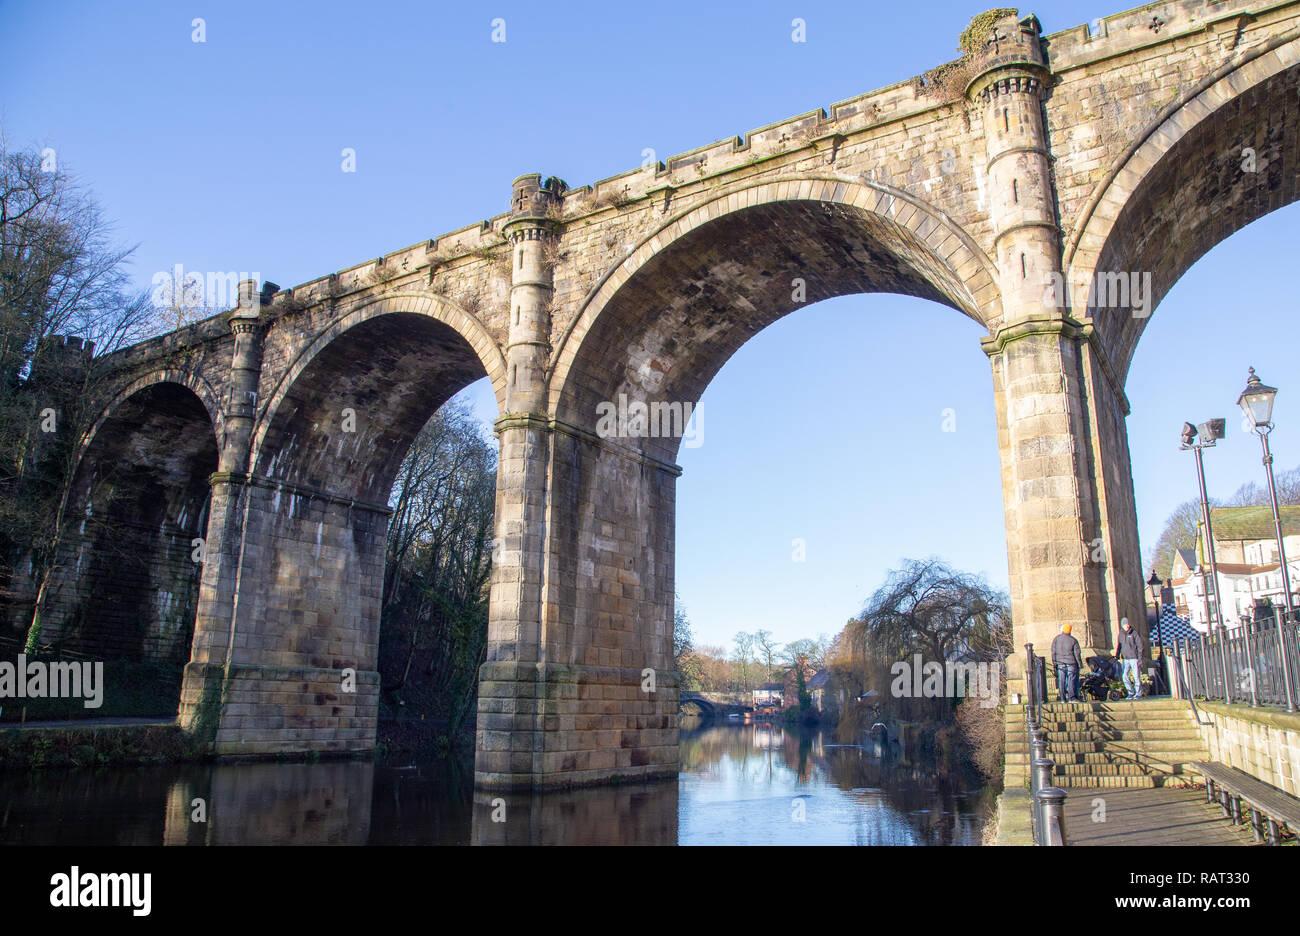 Knaresborough Railway Viaduct Bridge closeup, River Nidd, North Yorkshire, England, UK Stock Photo